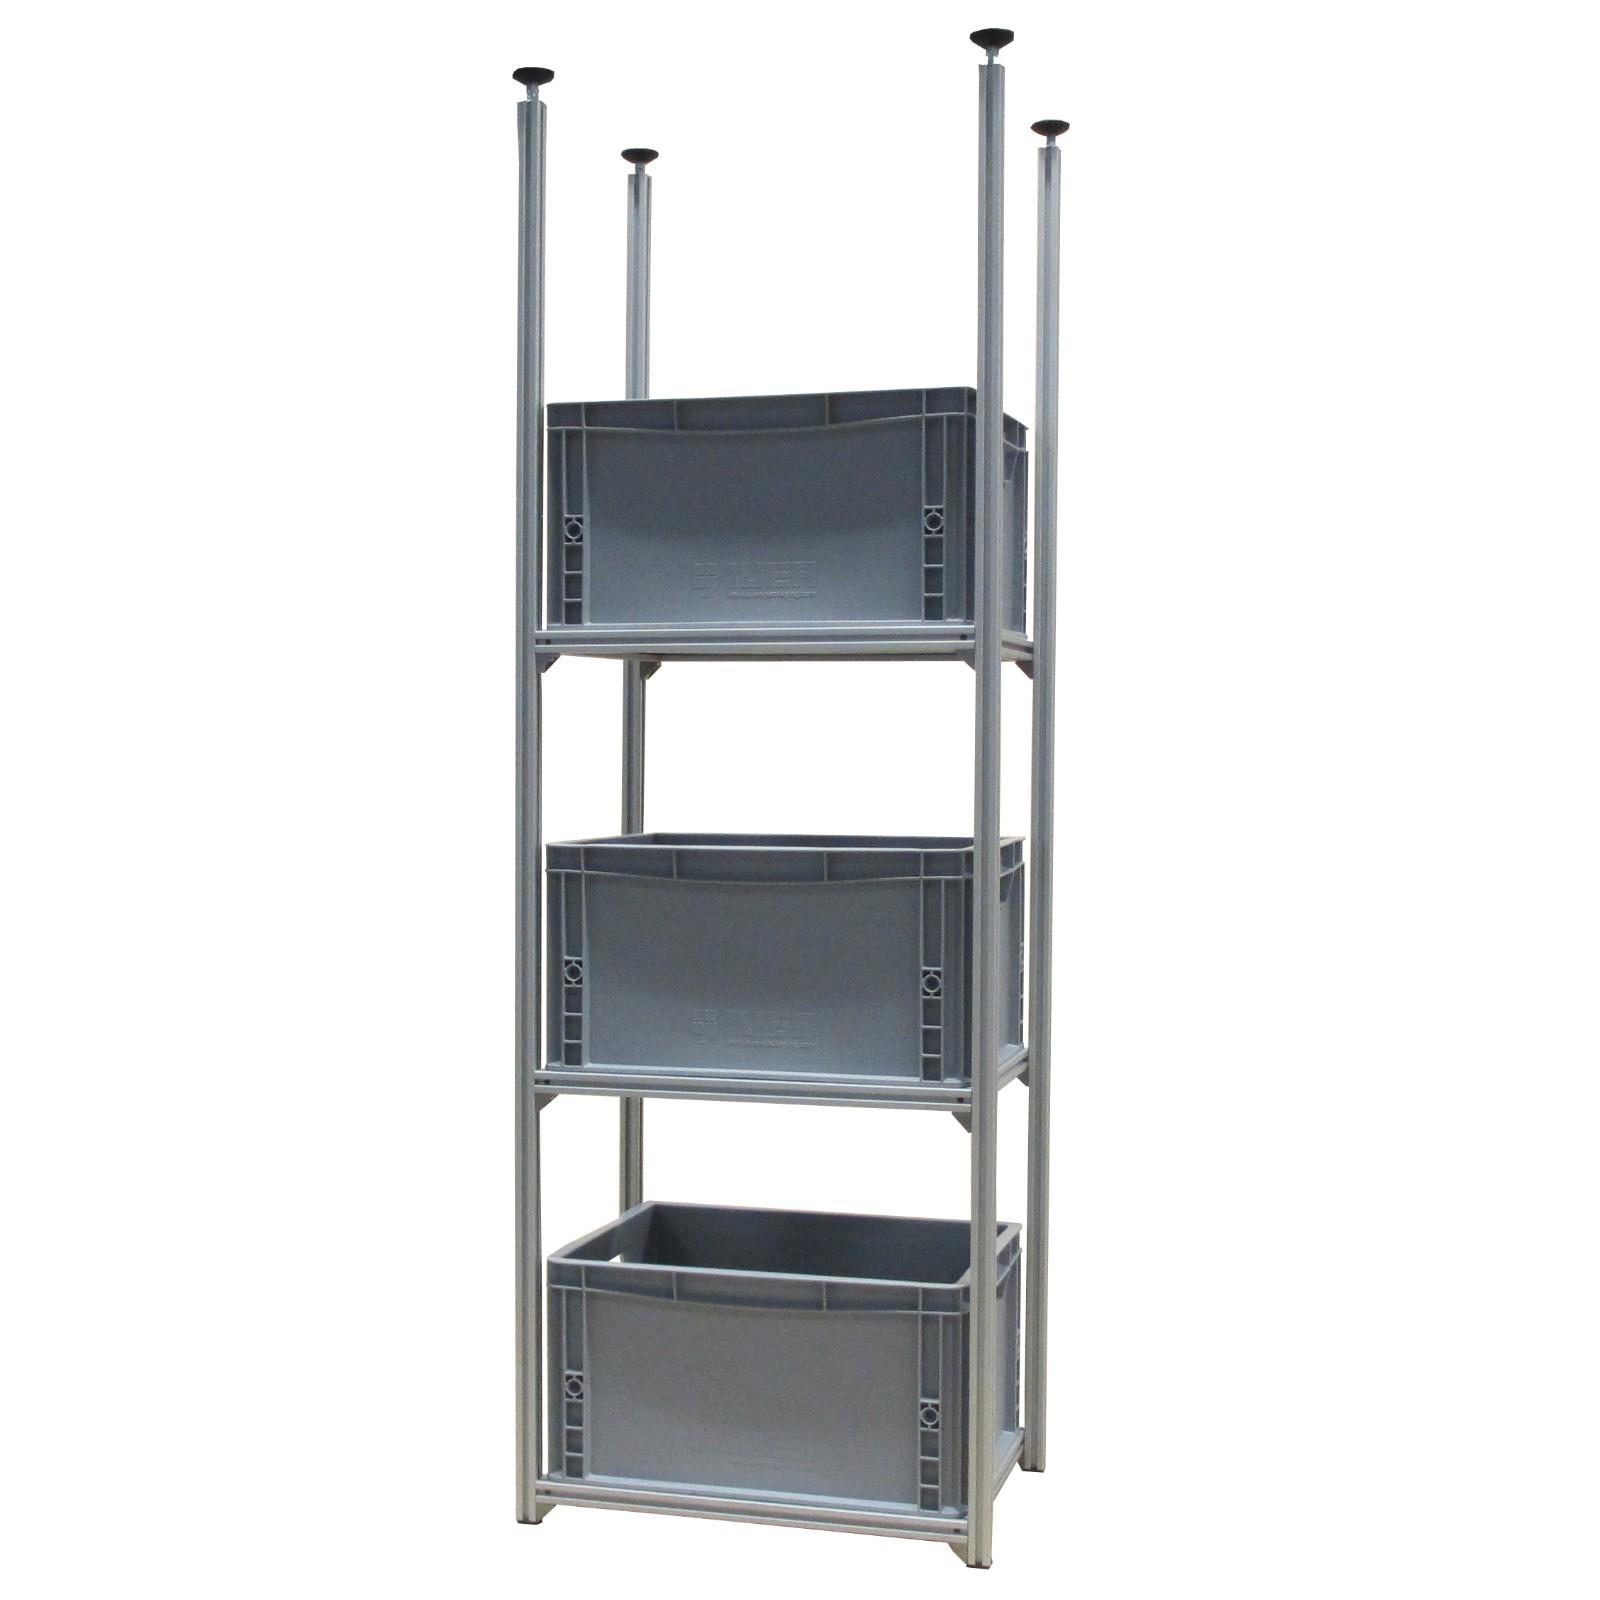 aluprofiltechnik regalsystem rl 400 x 300 f r 3 kisten. Black Bedroom Furniture Sets. Home Design Ideas